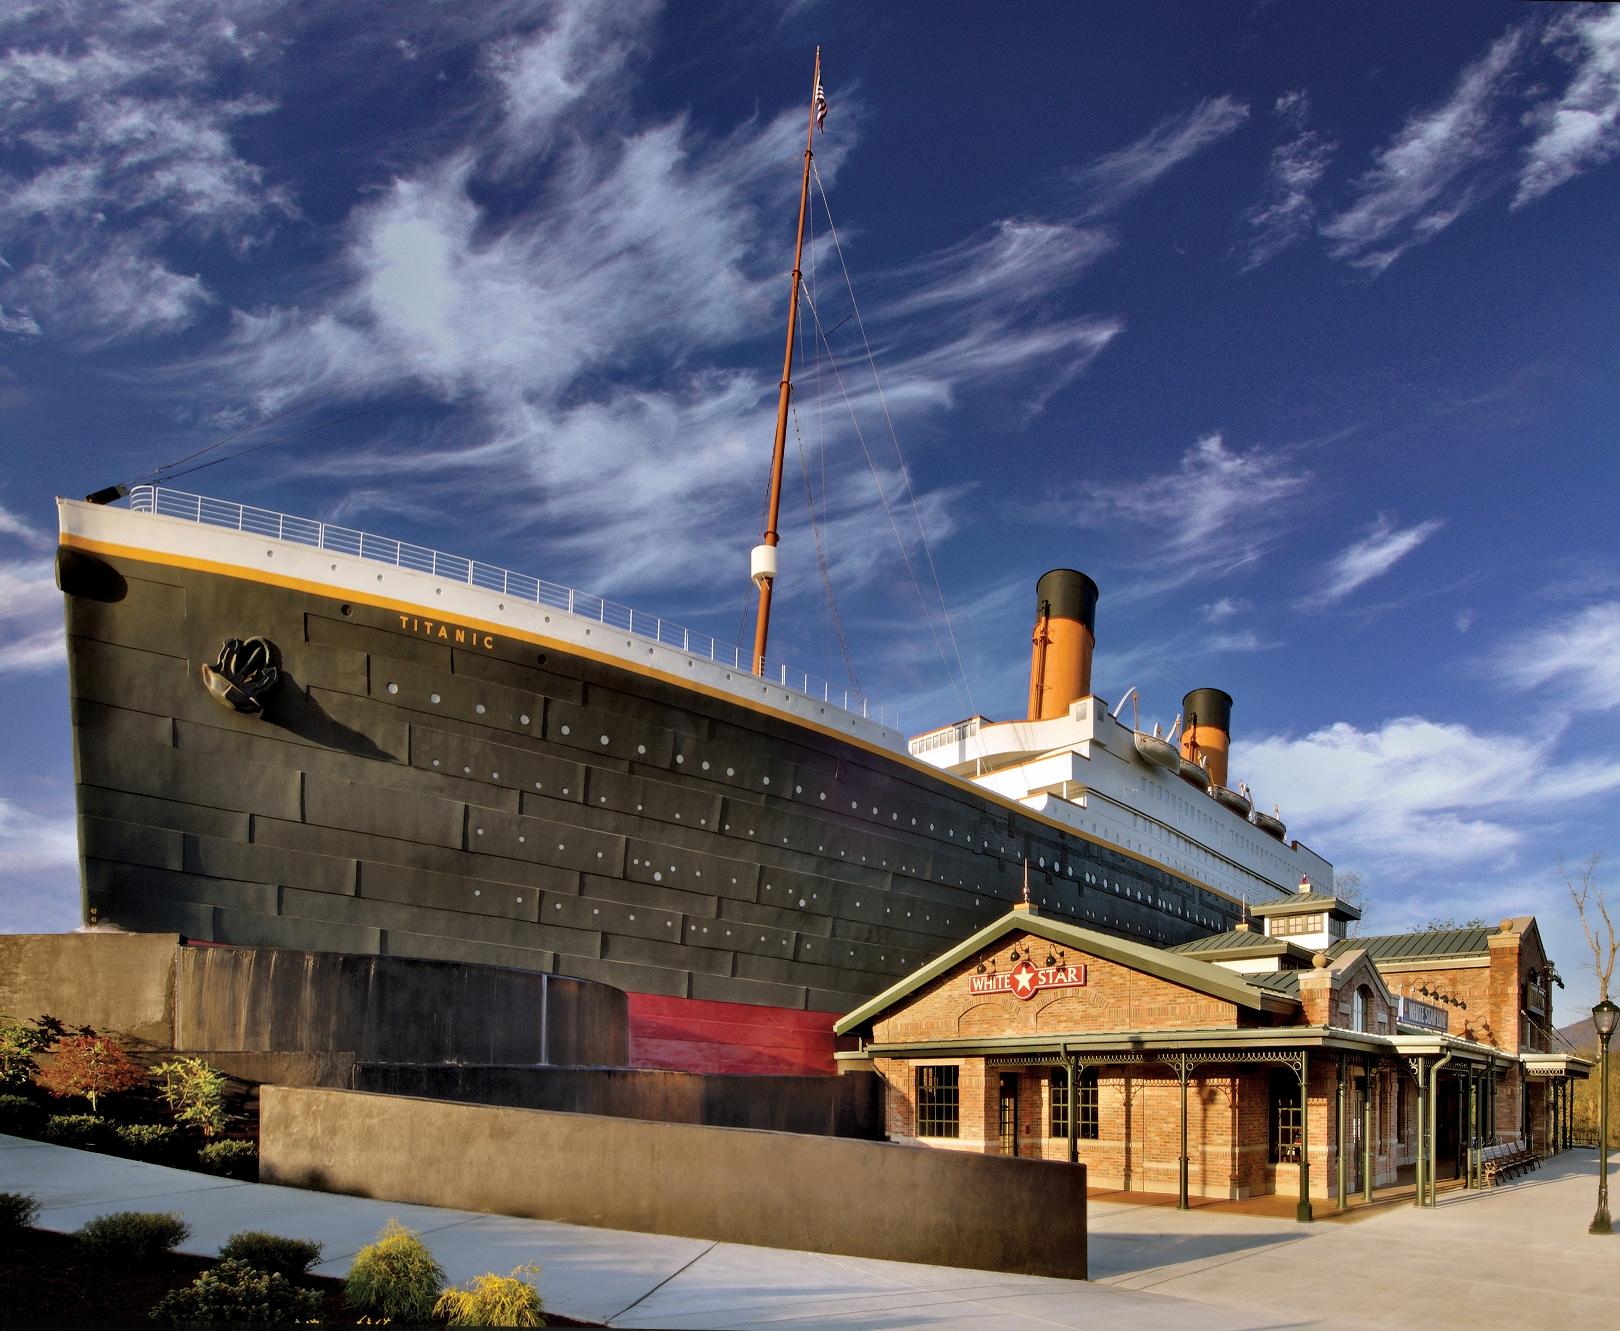 Titanic Museum attractions : GoingPlacesNearAndFaru0026#39;s Blog